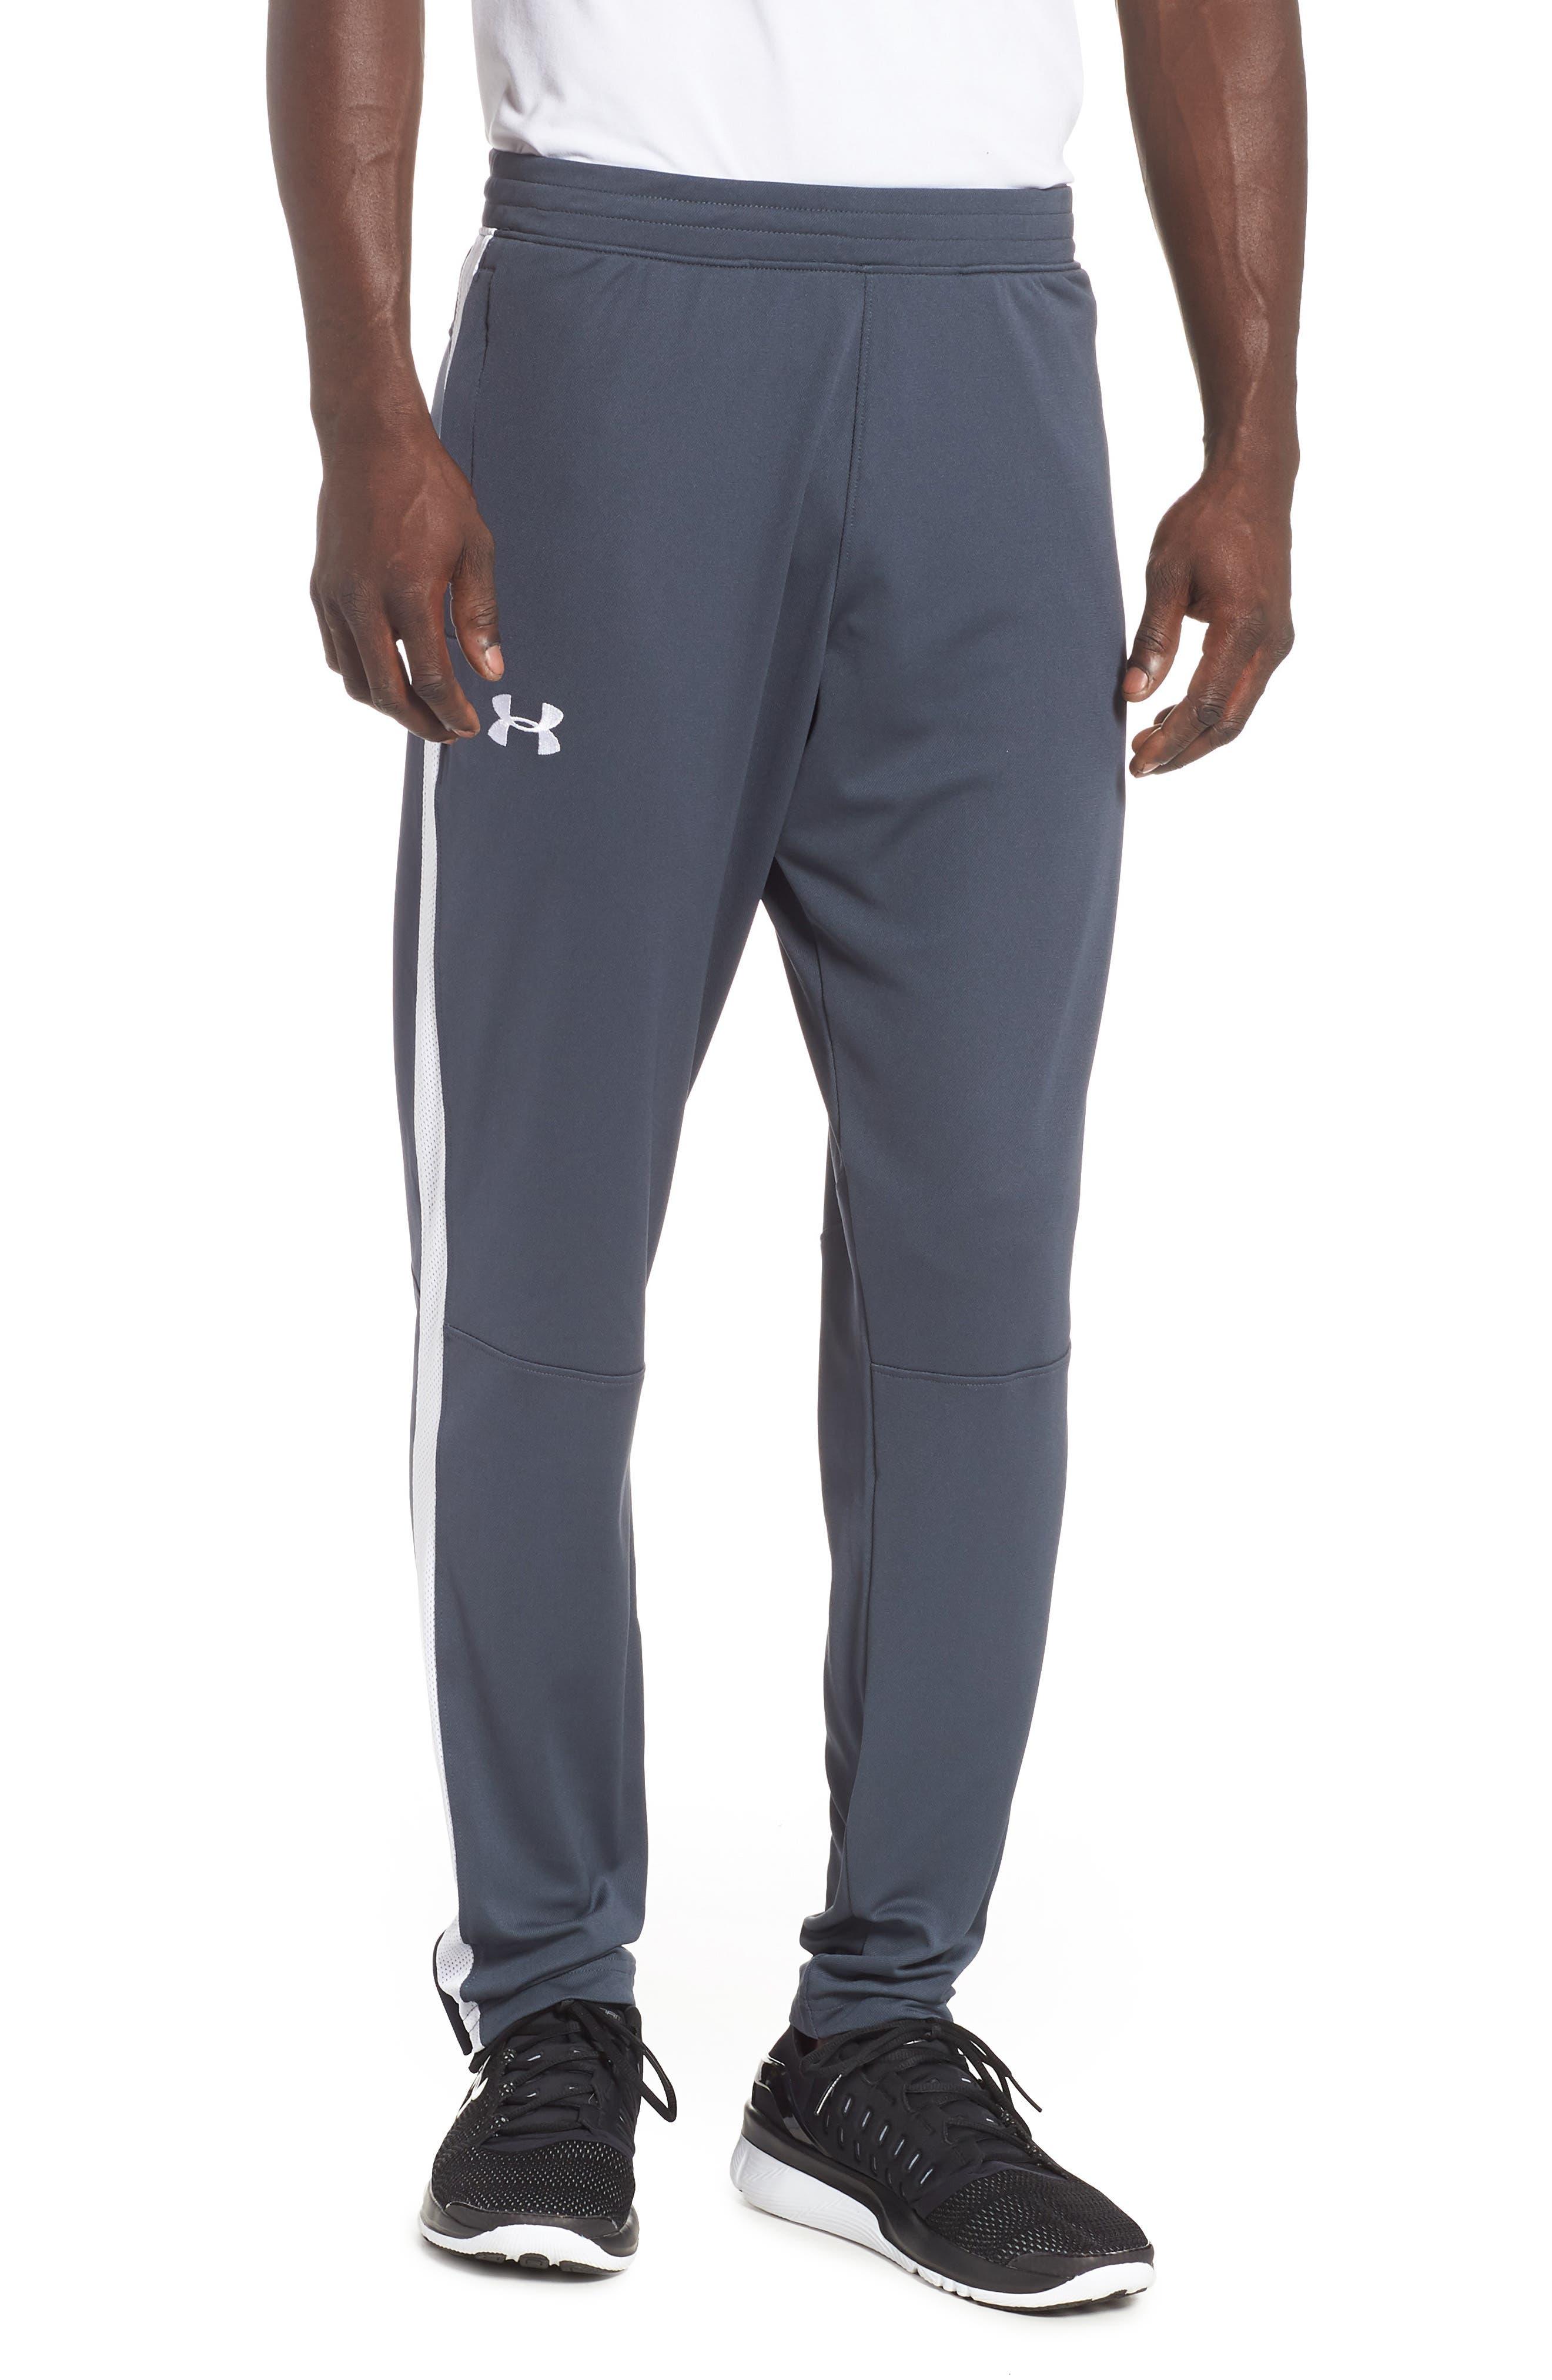 Sportstyle Slim Piqué Track Pants,                             Main thumbnail 1, color,                             STEALTH GRAY / / WHITE